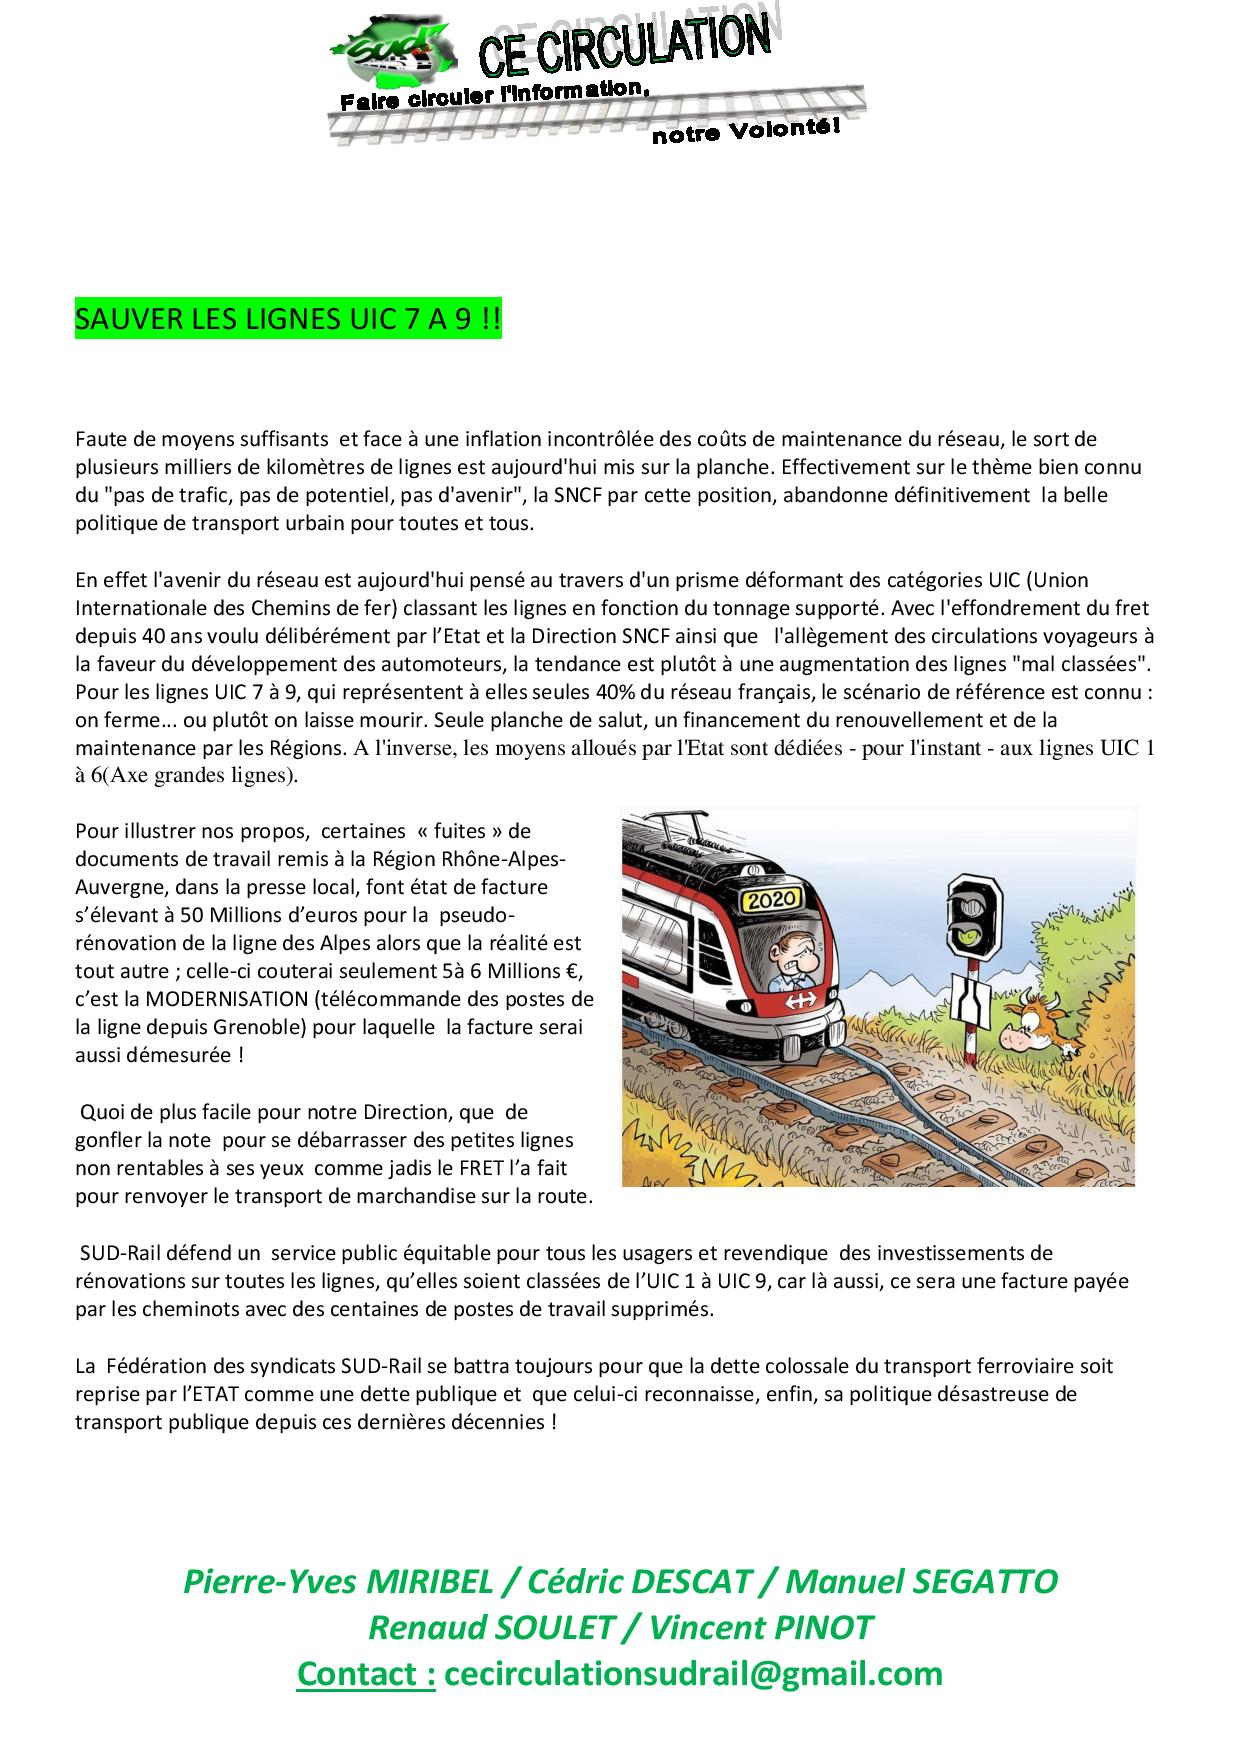 cr-ce-circulation-10-2016-page-002